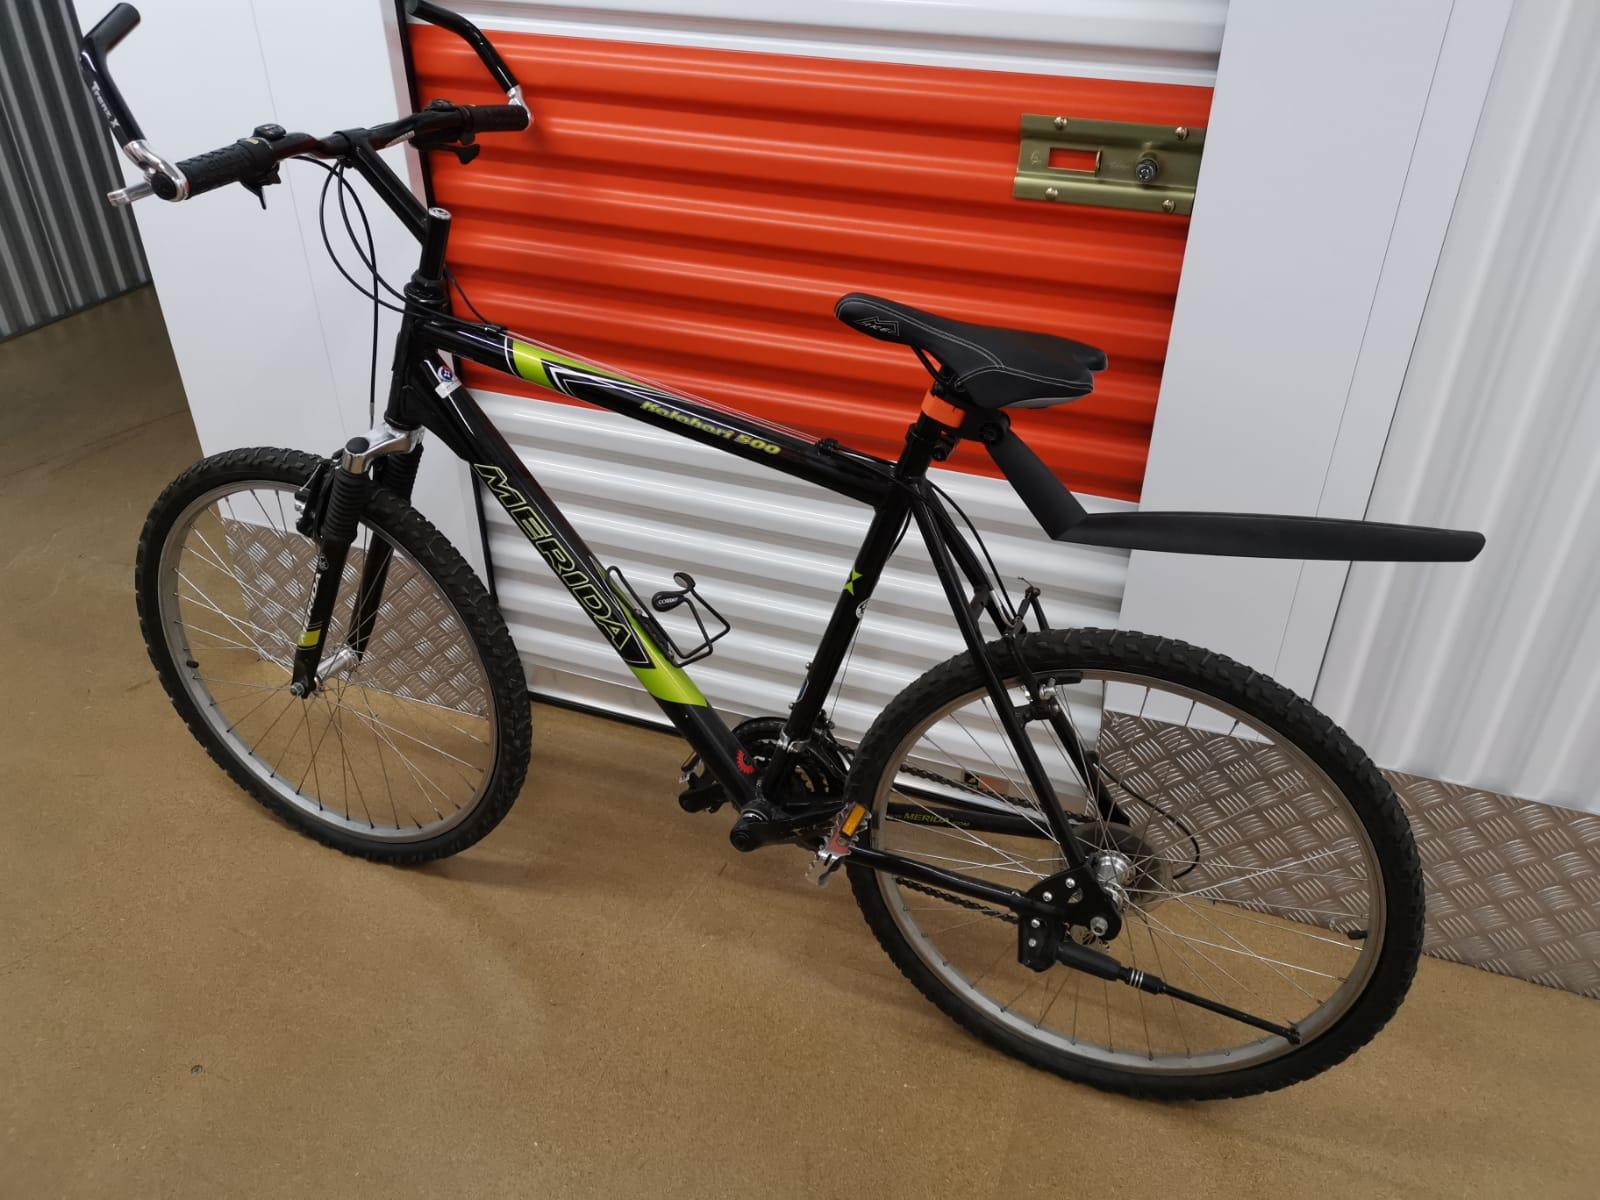 Stoere zwarte mountainbike